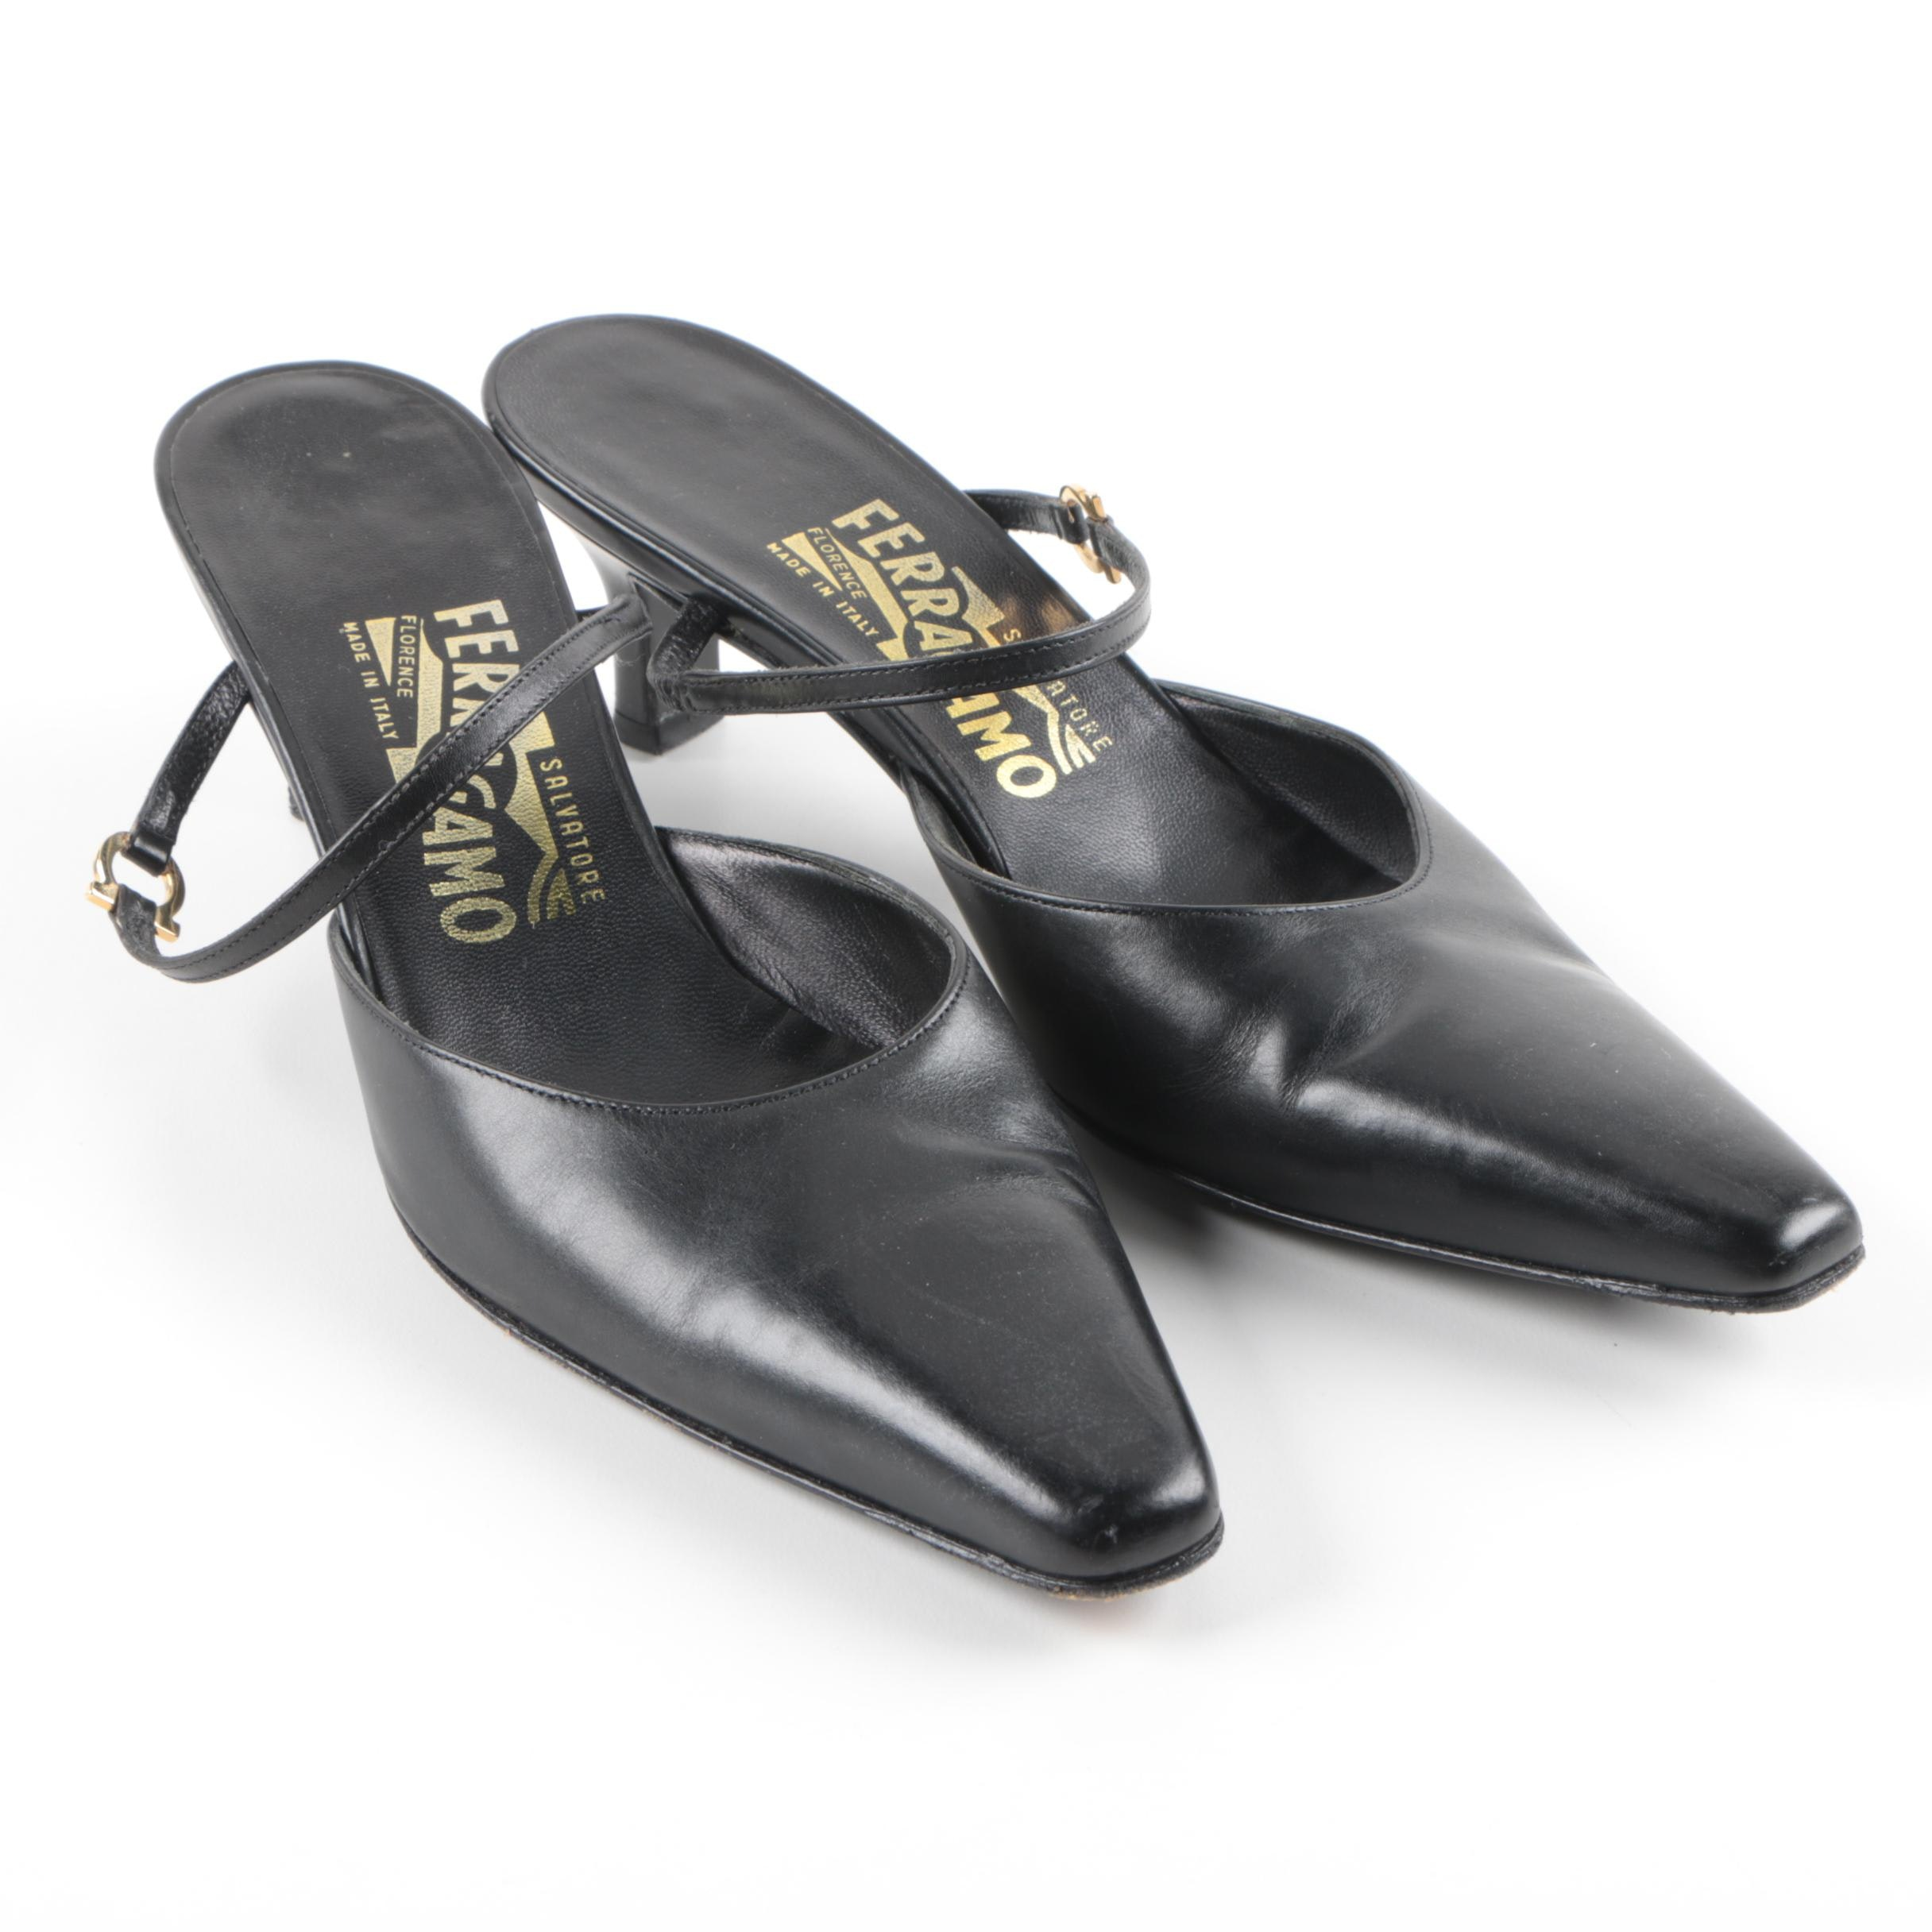 Women's Salvatore Ferragamo Black Leather Mules